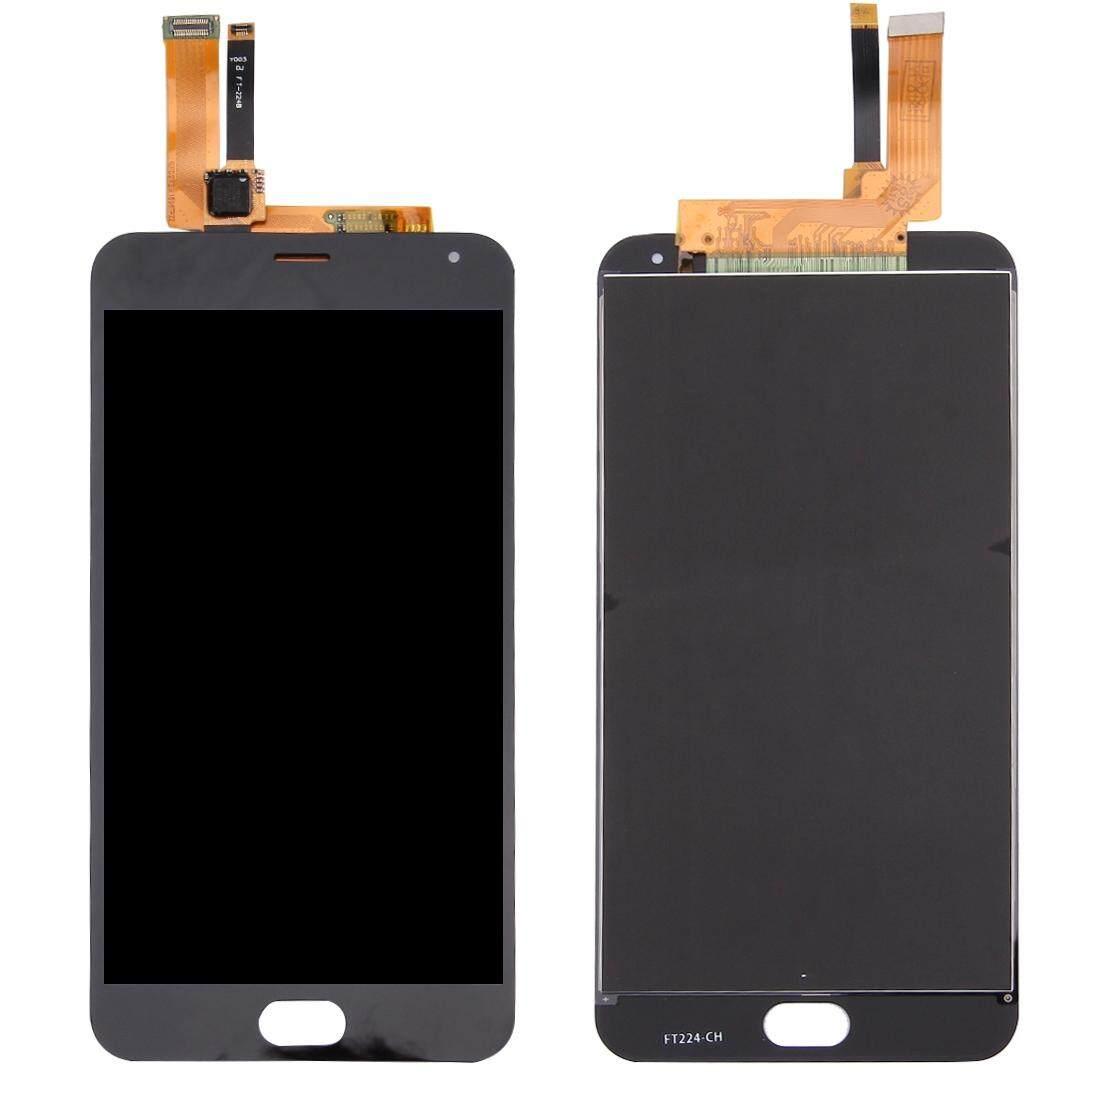 Meizu M2 Catatan/Meilan Note 2 Layar LCD dan Digitizer Penuh Perakitan (Hitam)